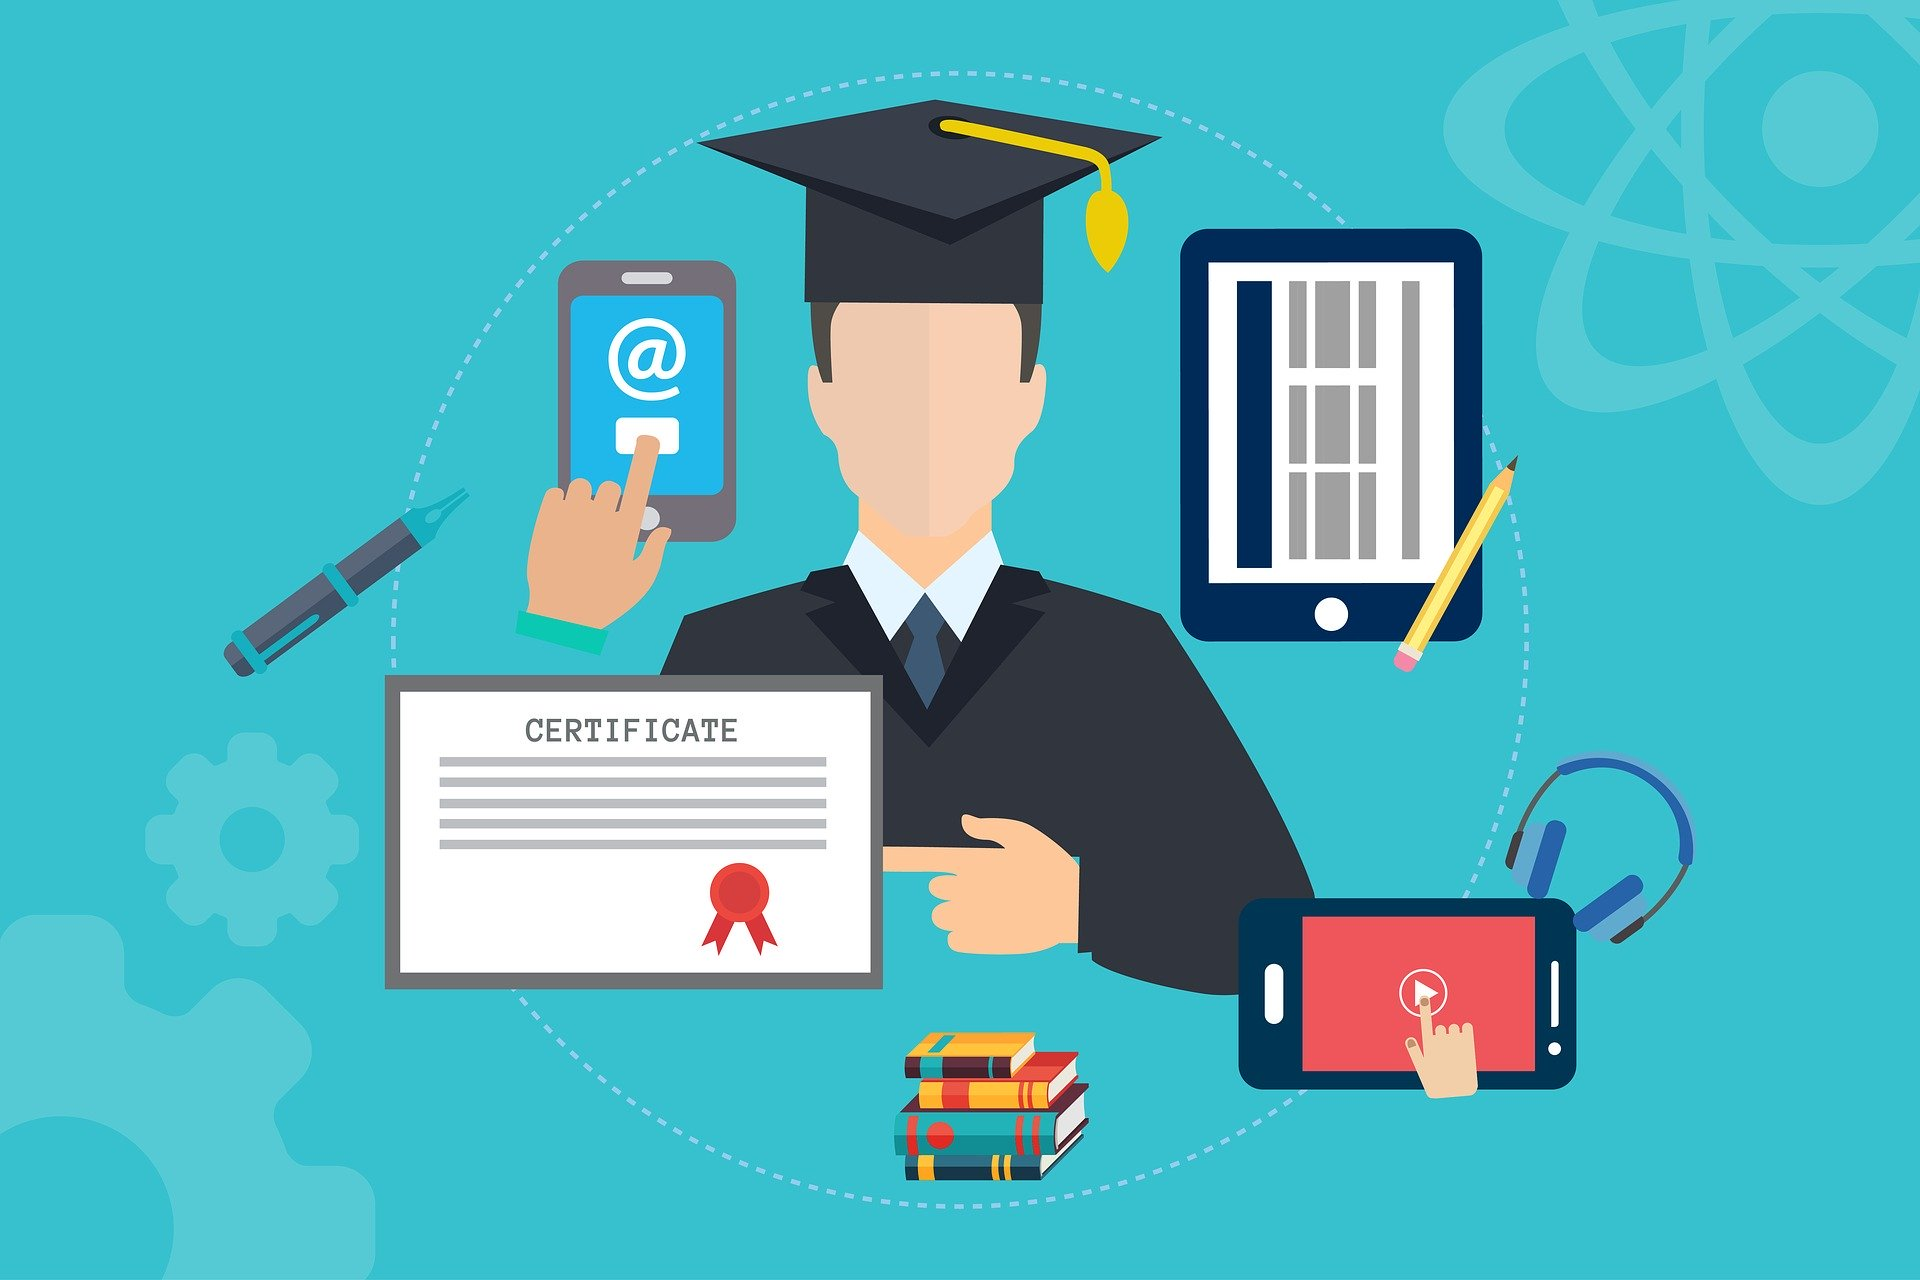 manfaat teknologi dalam pendidikan